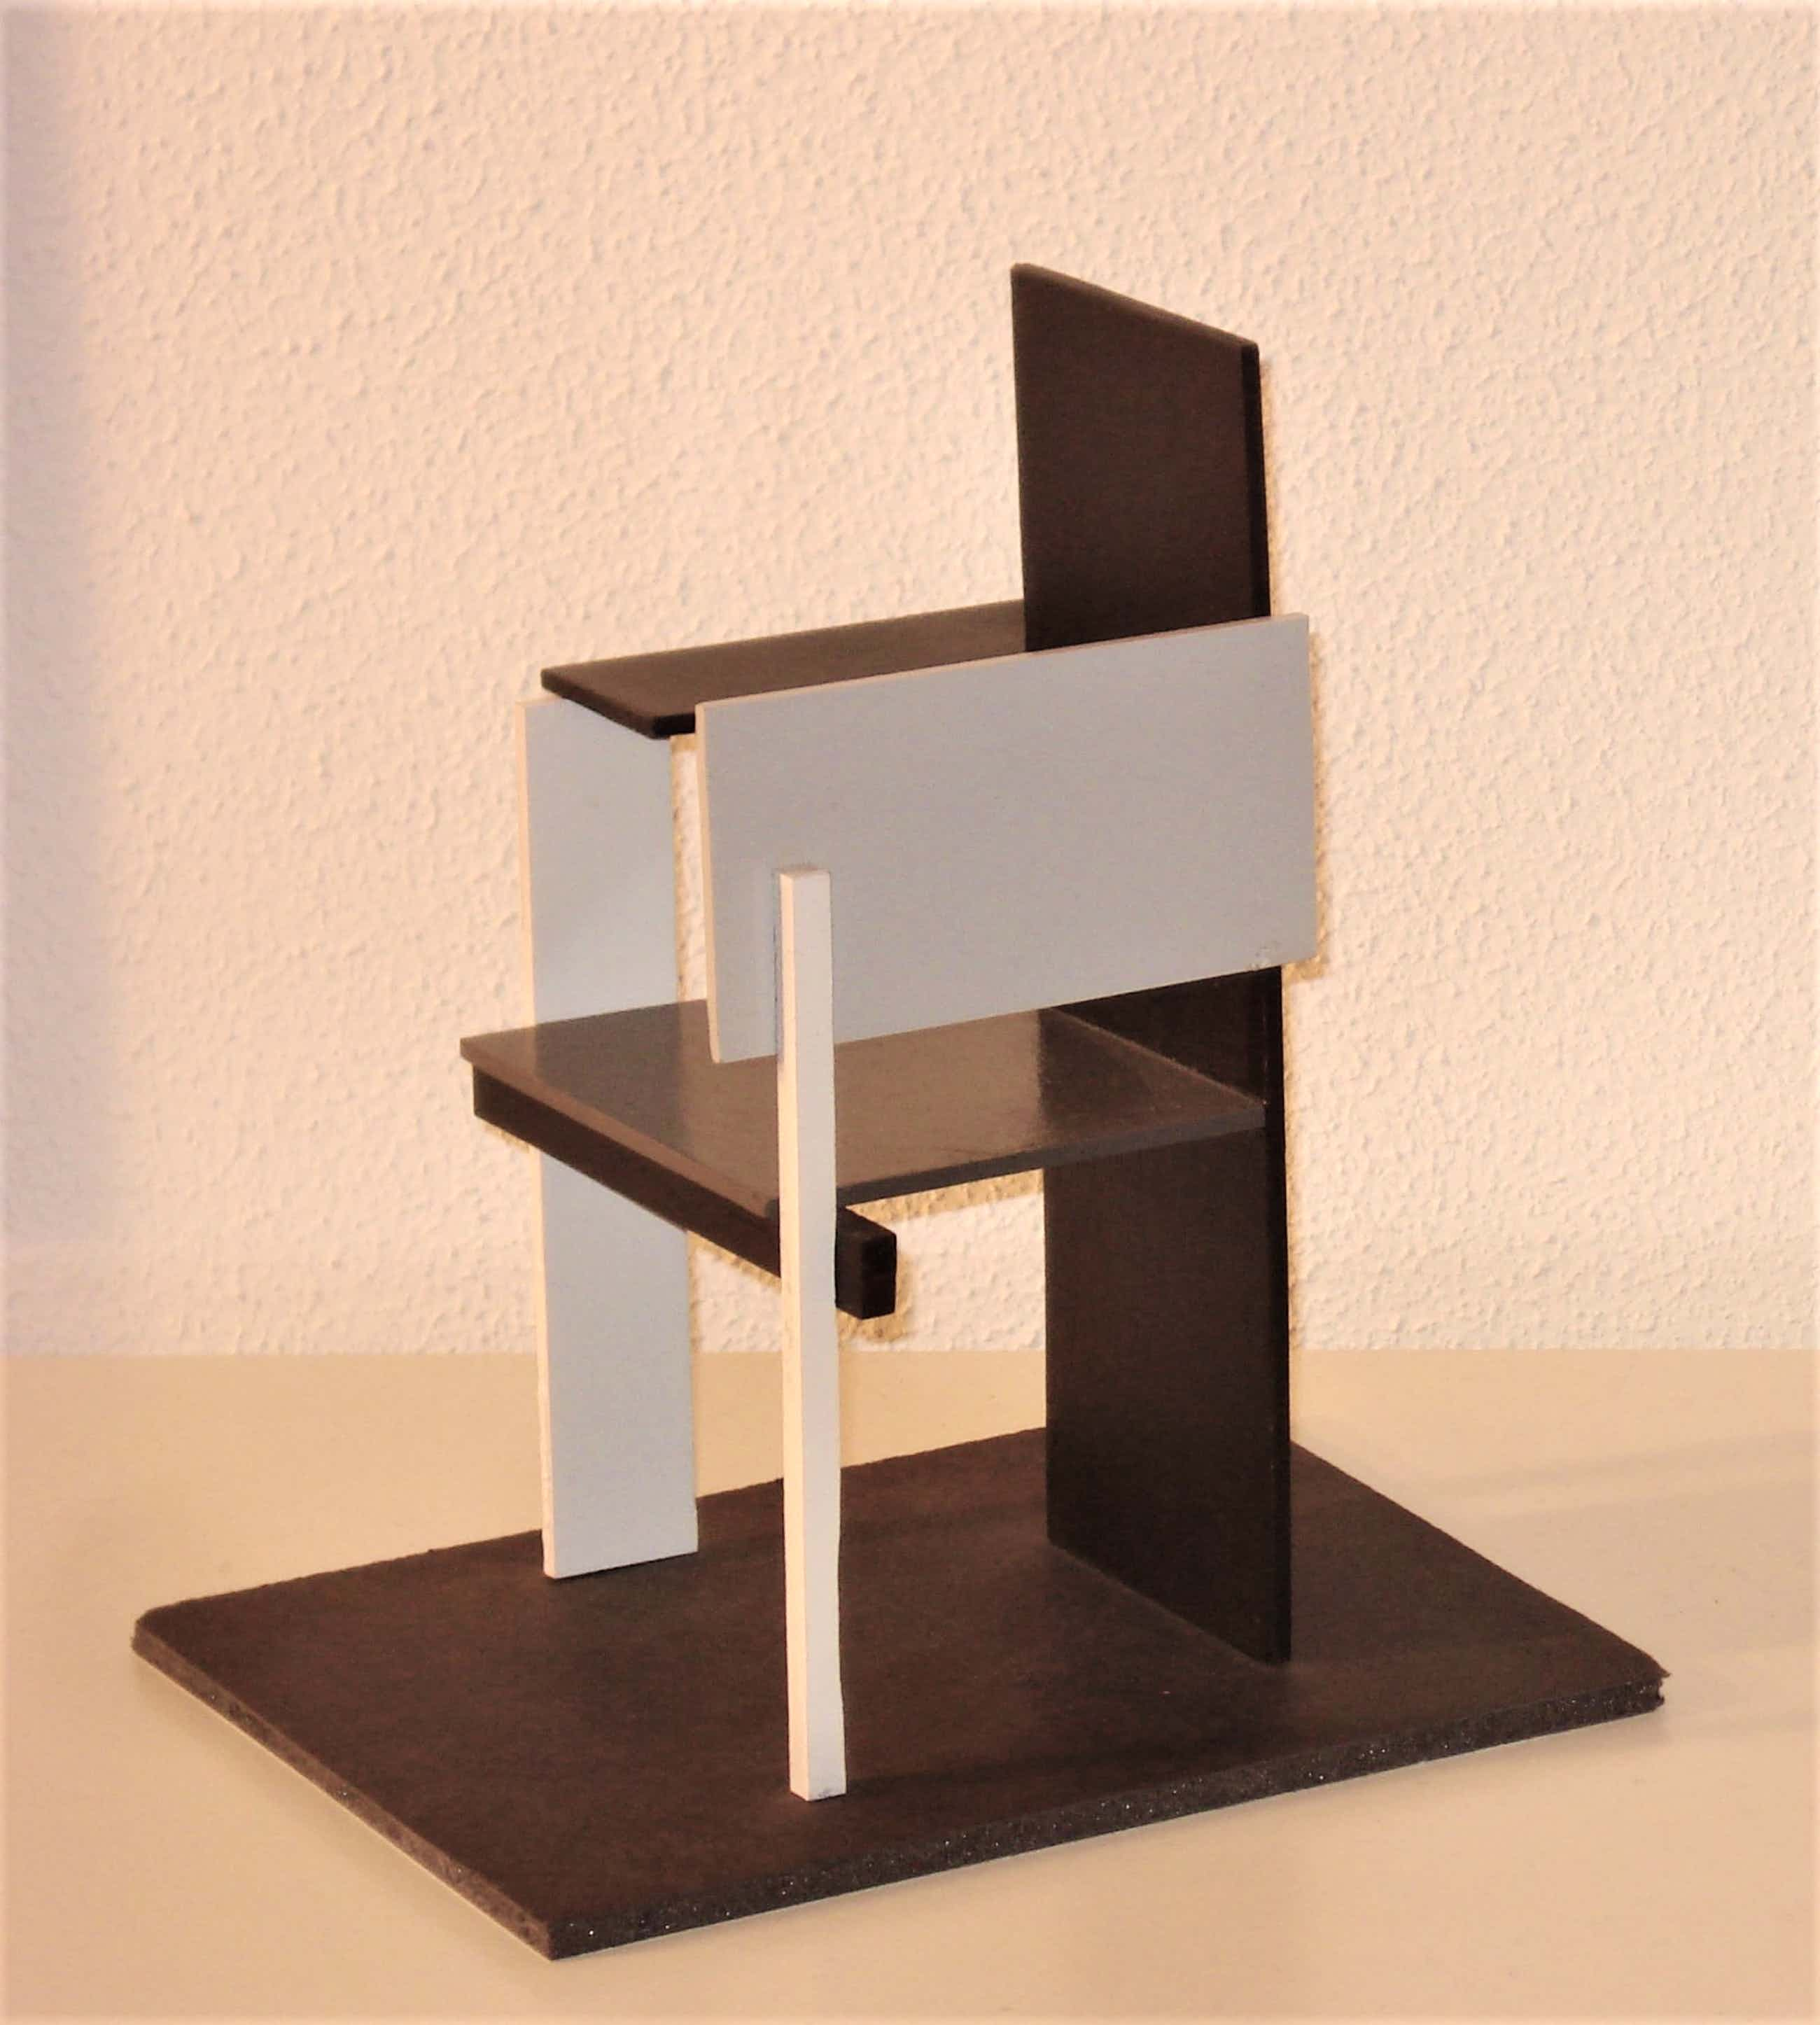 Gerrit Rietveld - Berlijnse Stoel Gerrit Rietveld, miniatuur 1:12 kopen? Bied vanaf 75!